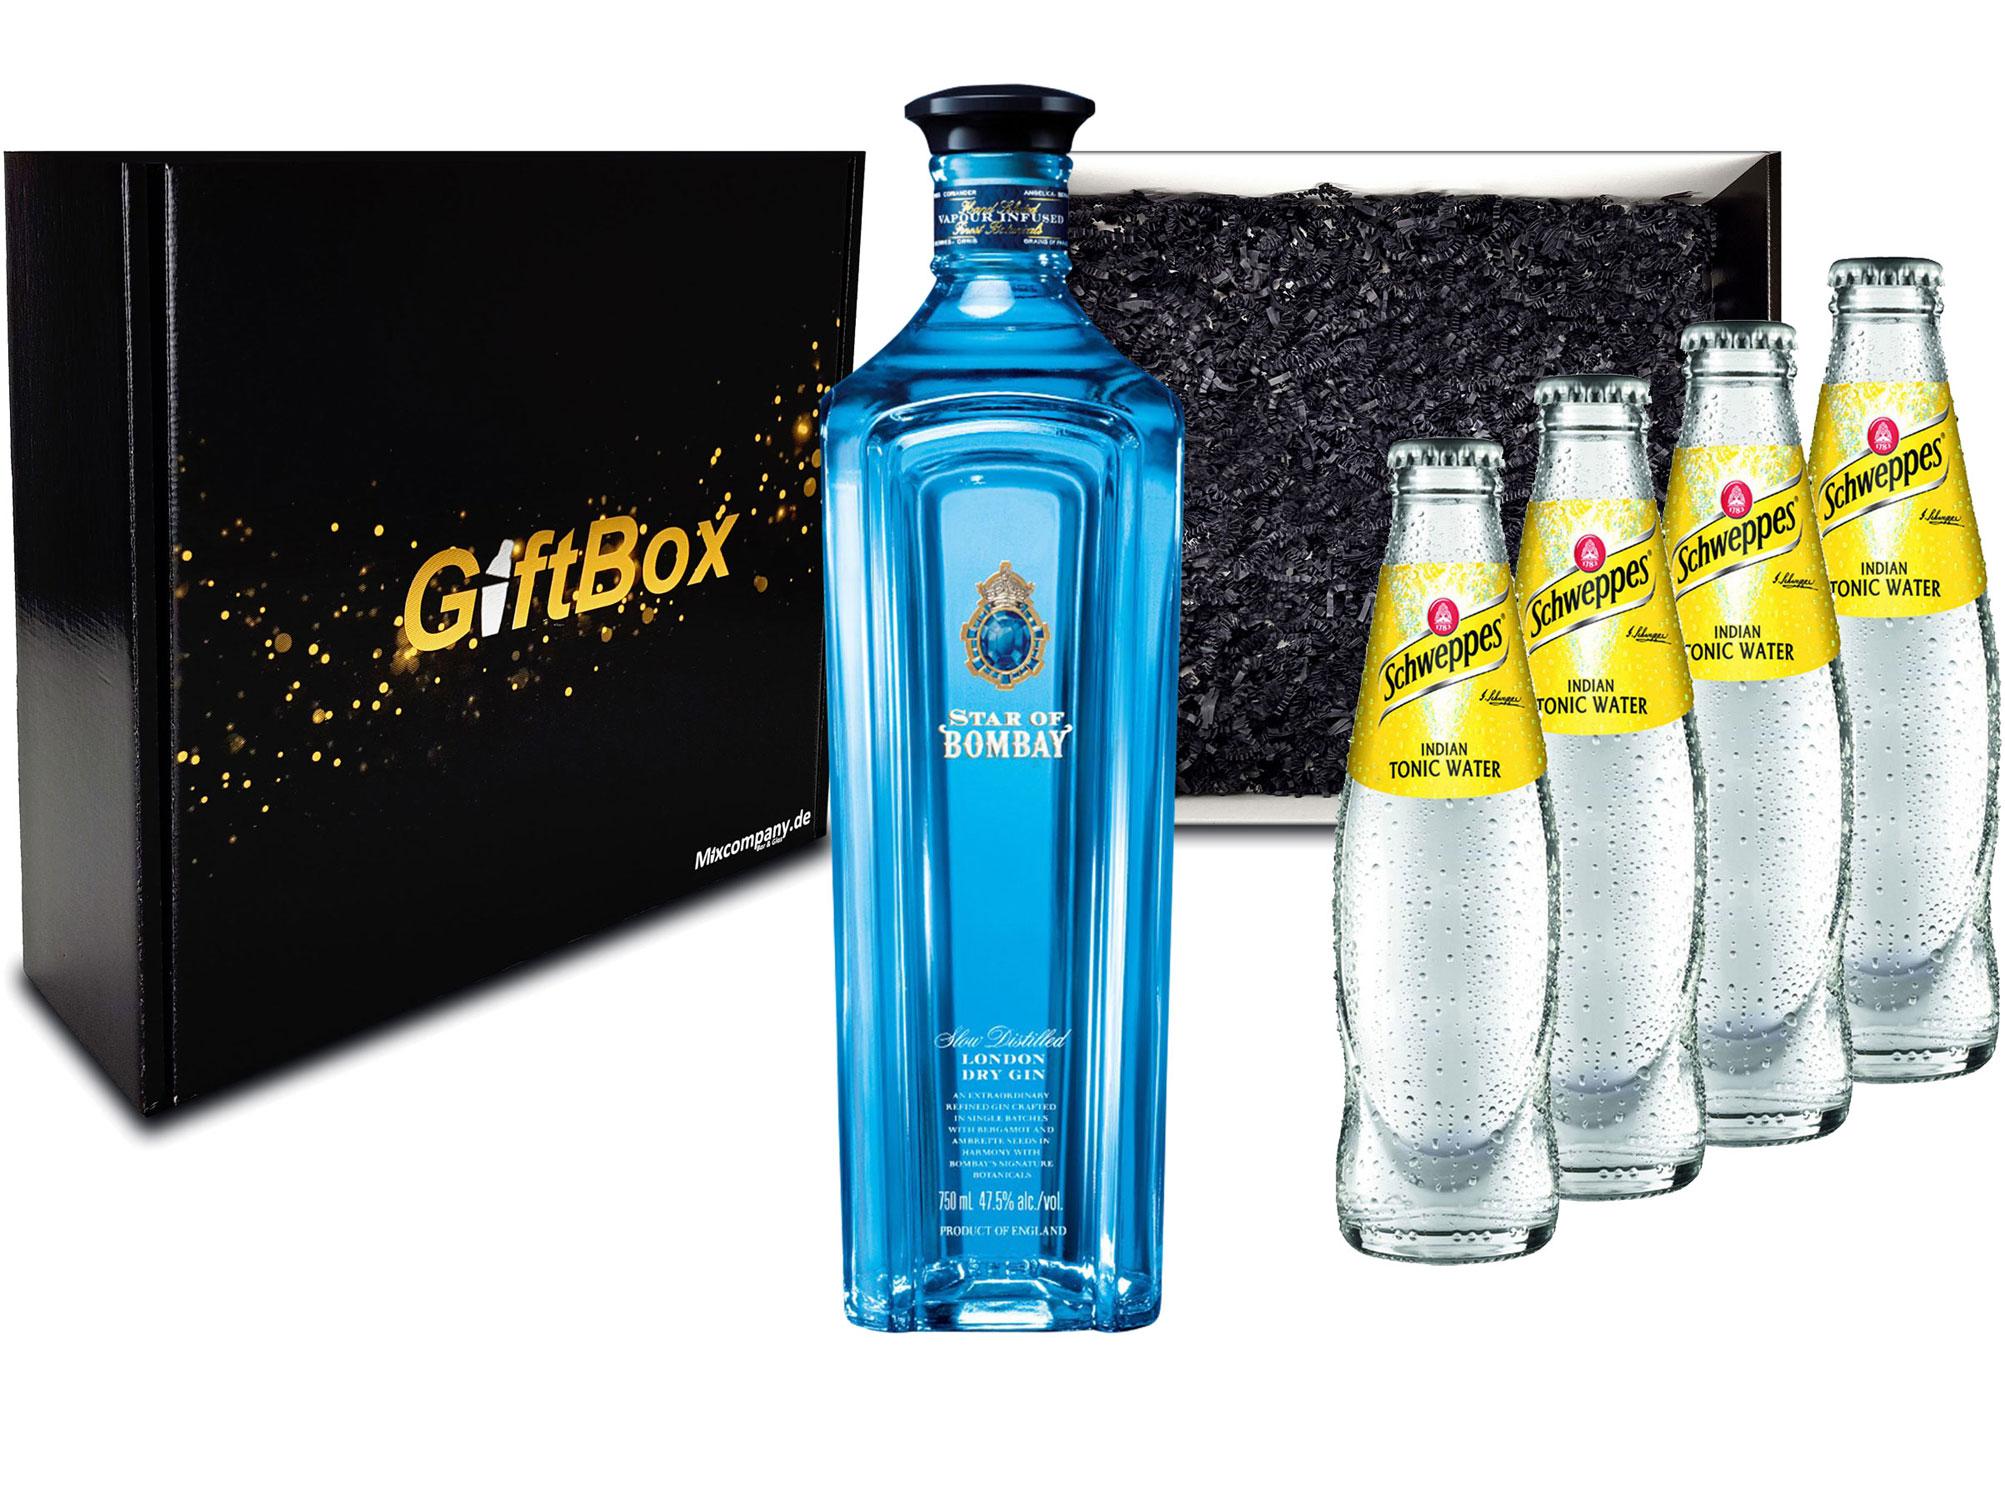 Gin Tonic Giftbox Geschenkset - Star of Bombay Slow Distilled London Dry Gin 0,7l (47,5% Vol) + 4x Schweppes Tonic Water 200ml inkl. Pfand MEHRWEG - [Enthält Sulfite]